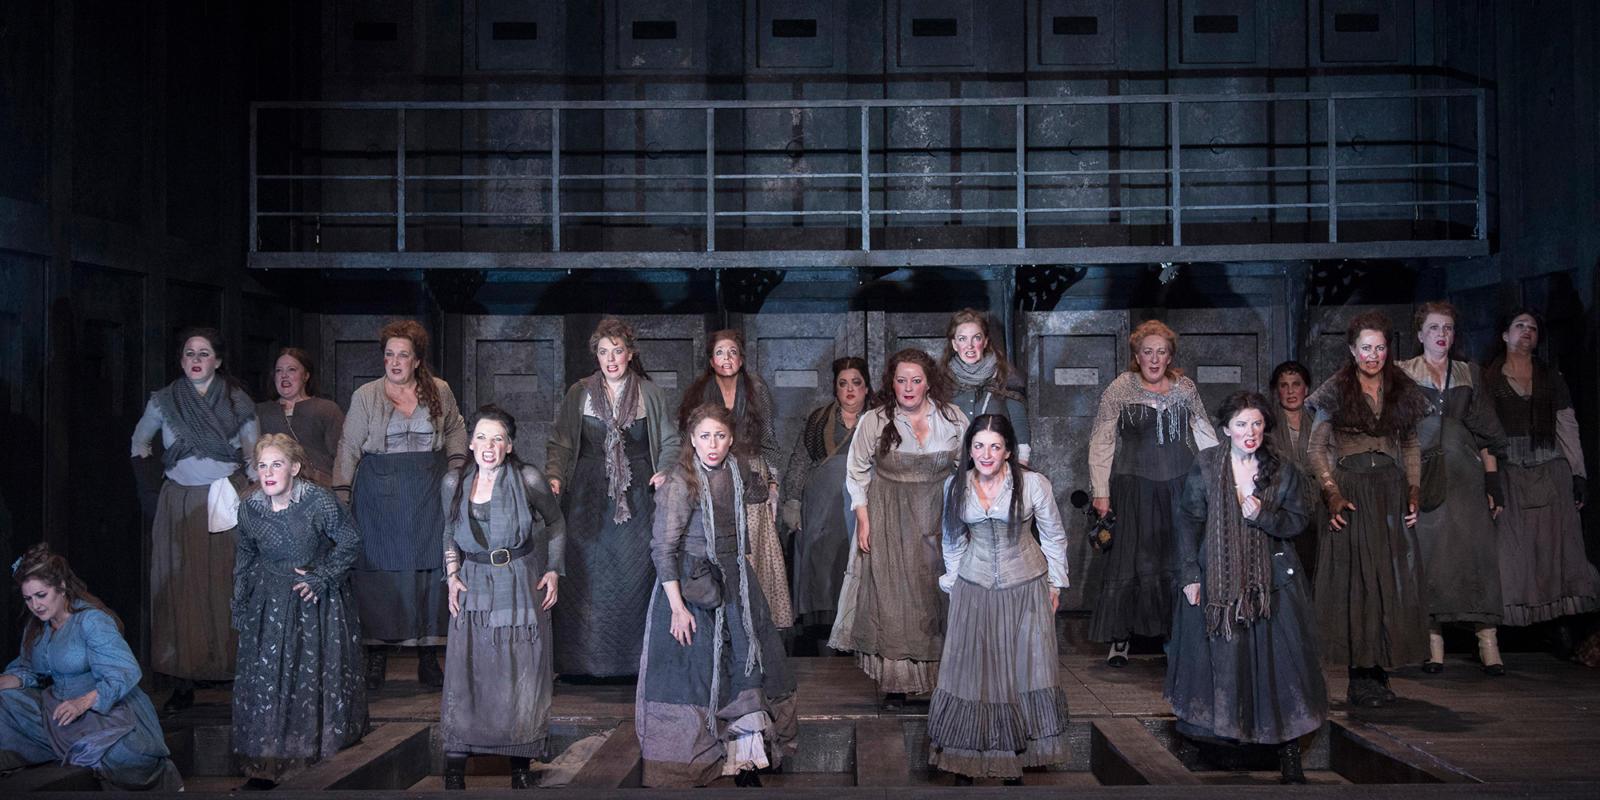 ENO 2018/19 Jack the Ripper: The Women of Whitechapel: ENO Chorus members © Alastair Muir